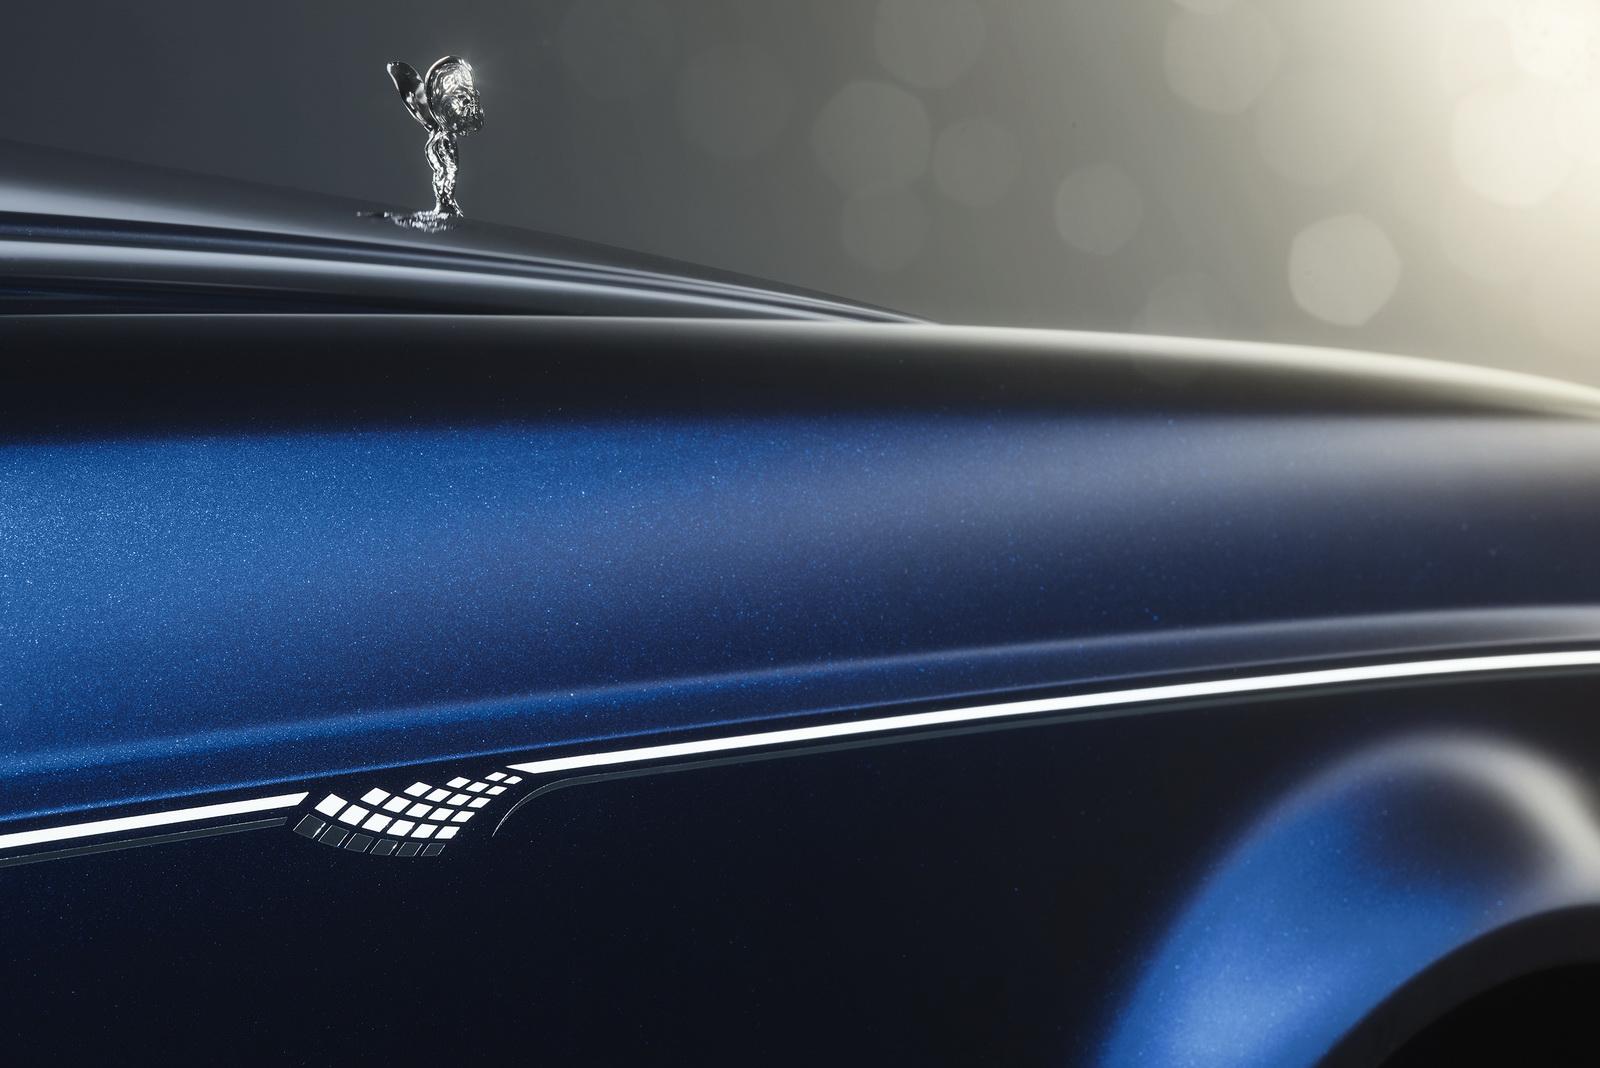 Nuova Rolls-Royce Phantom